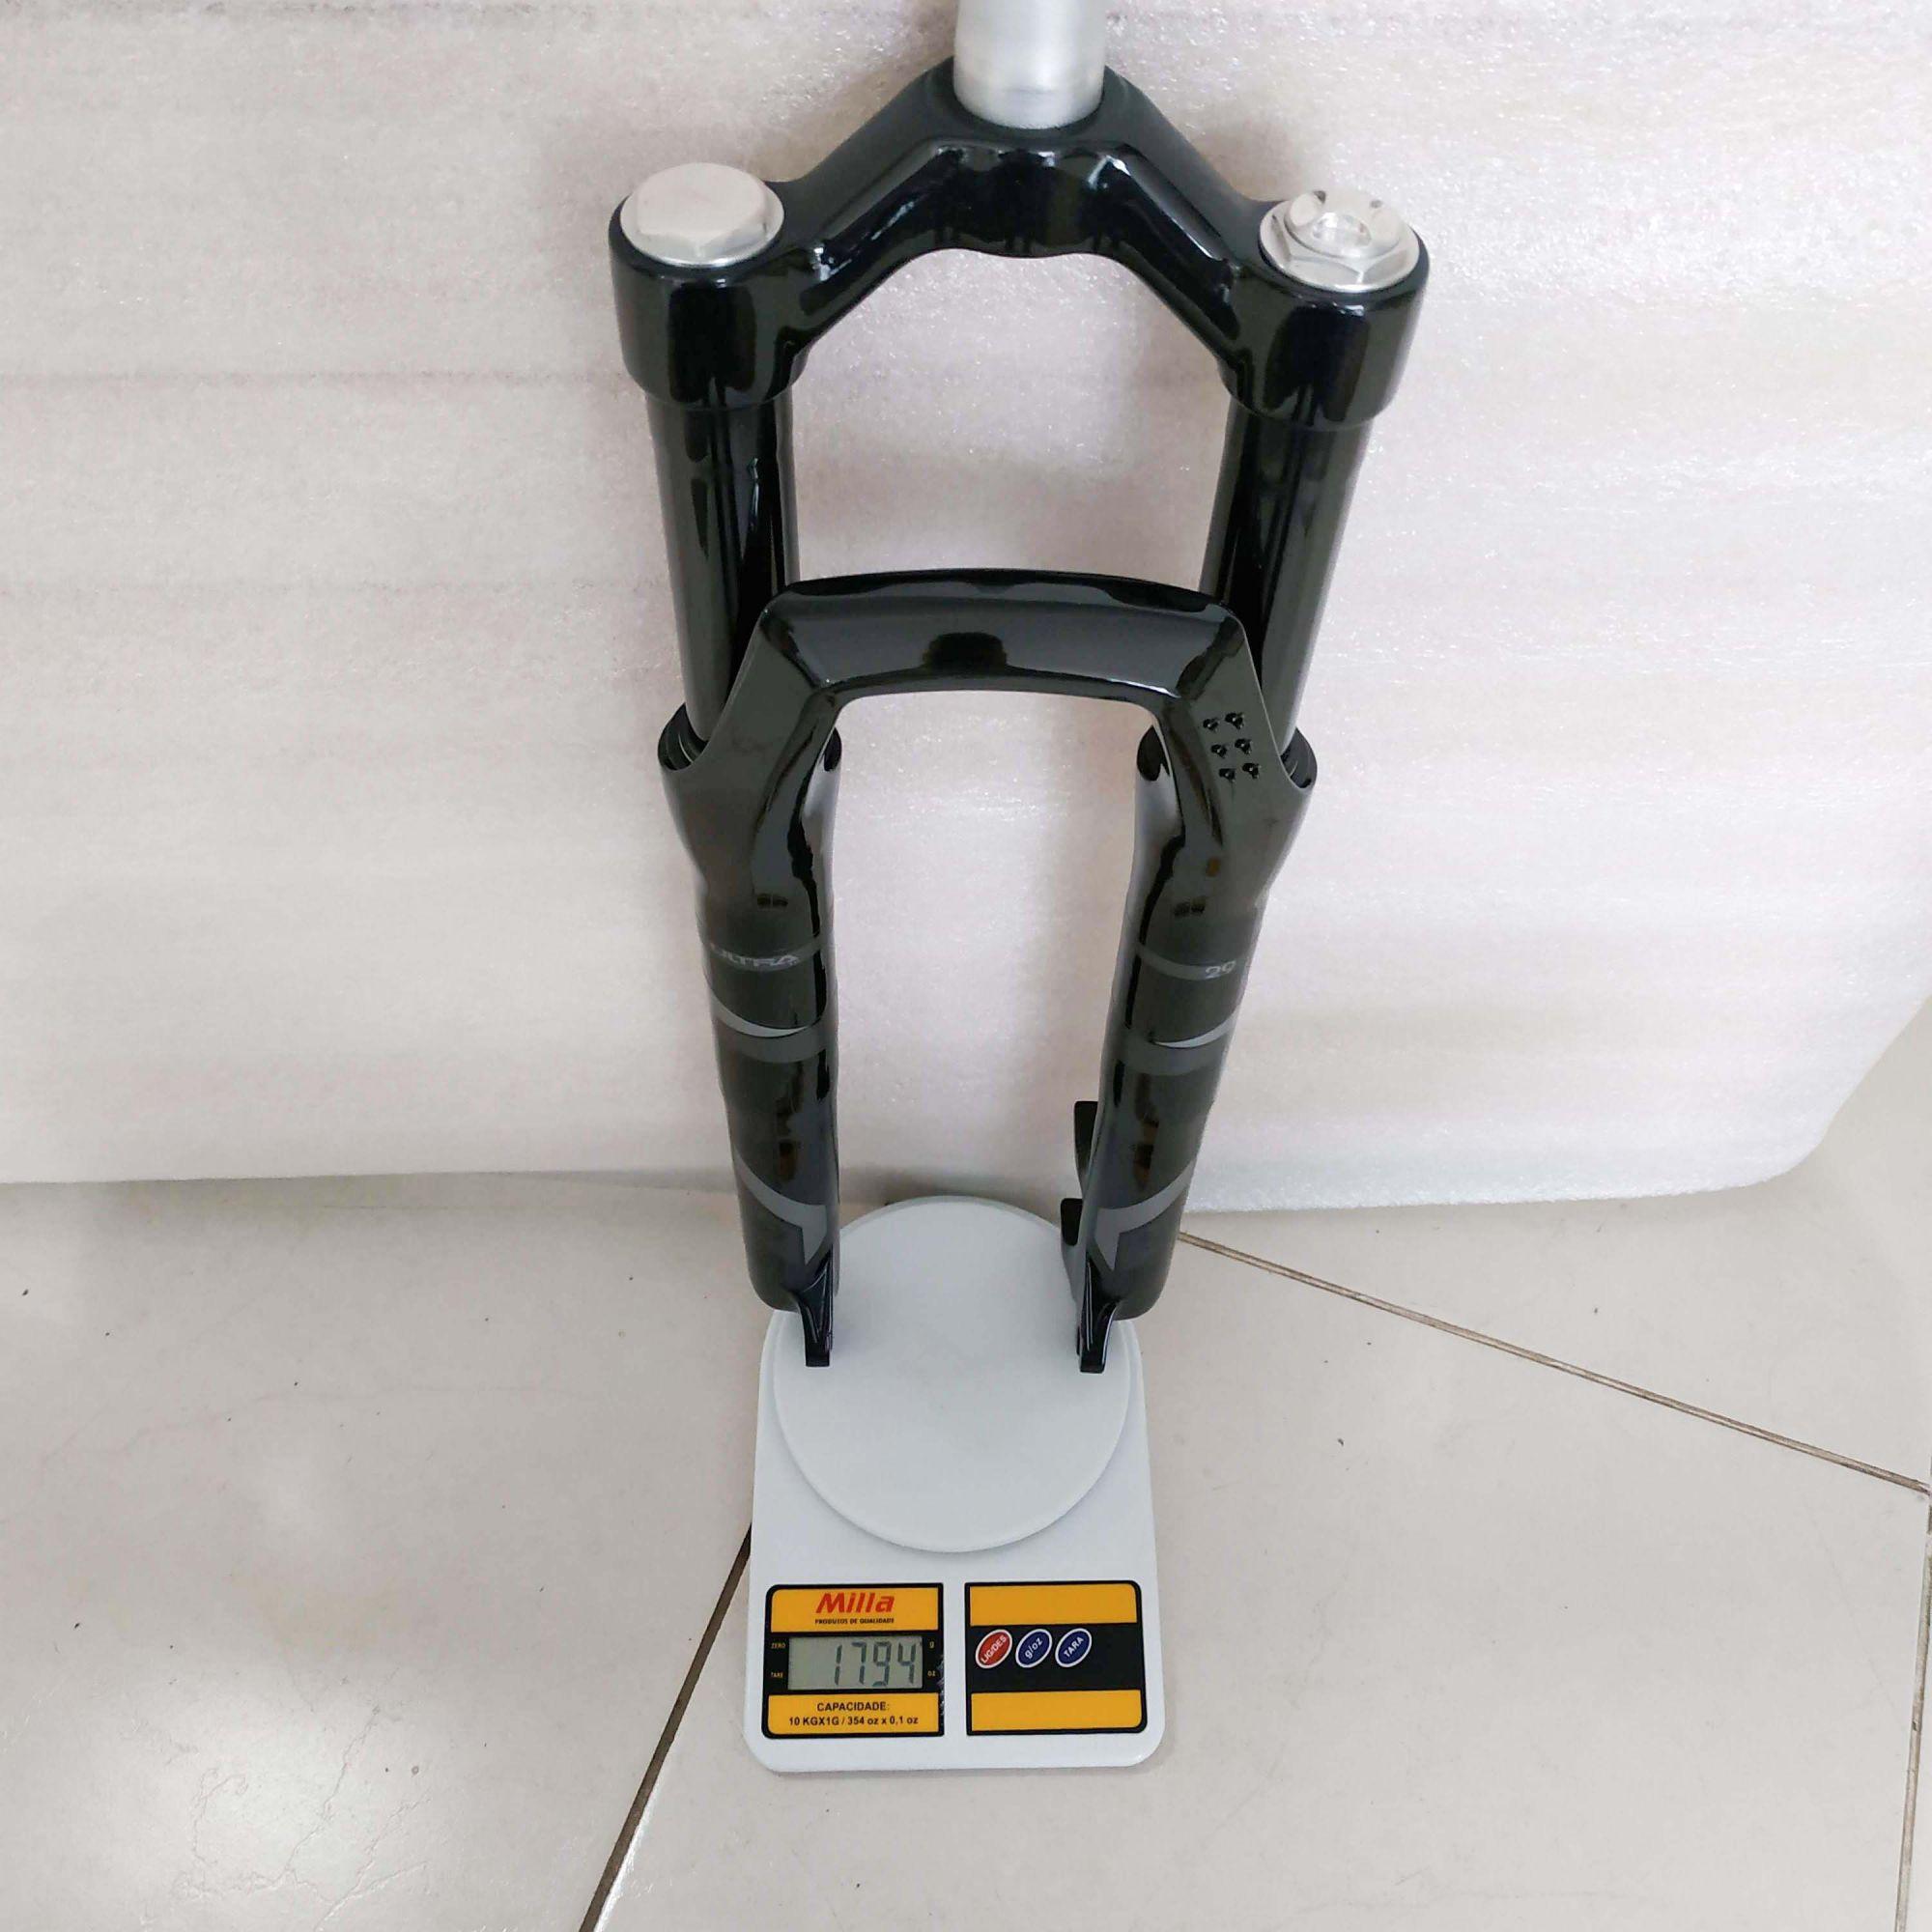 Suspensão 29 PROSHOCK Ultra TR32 Over 100 mm Cor Preto Brilho